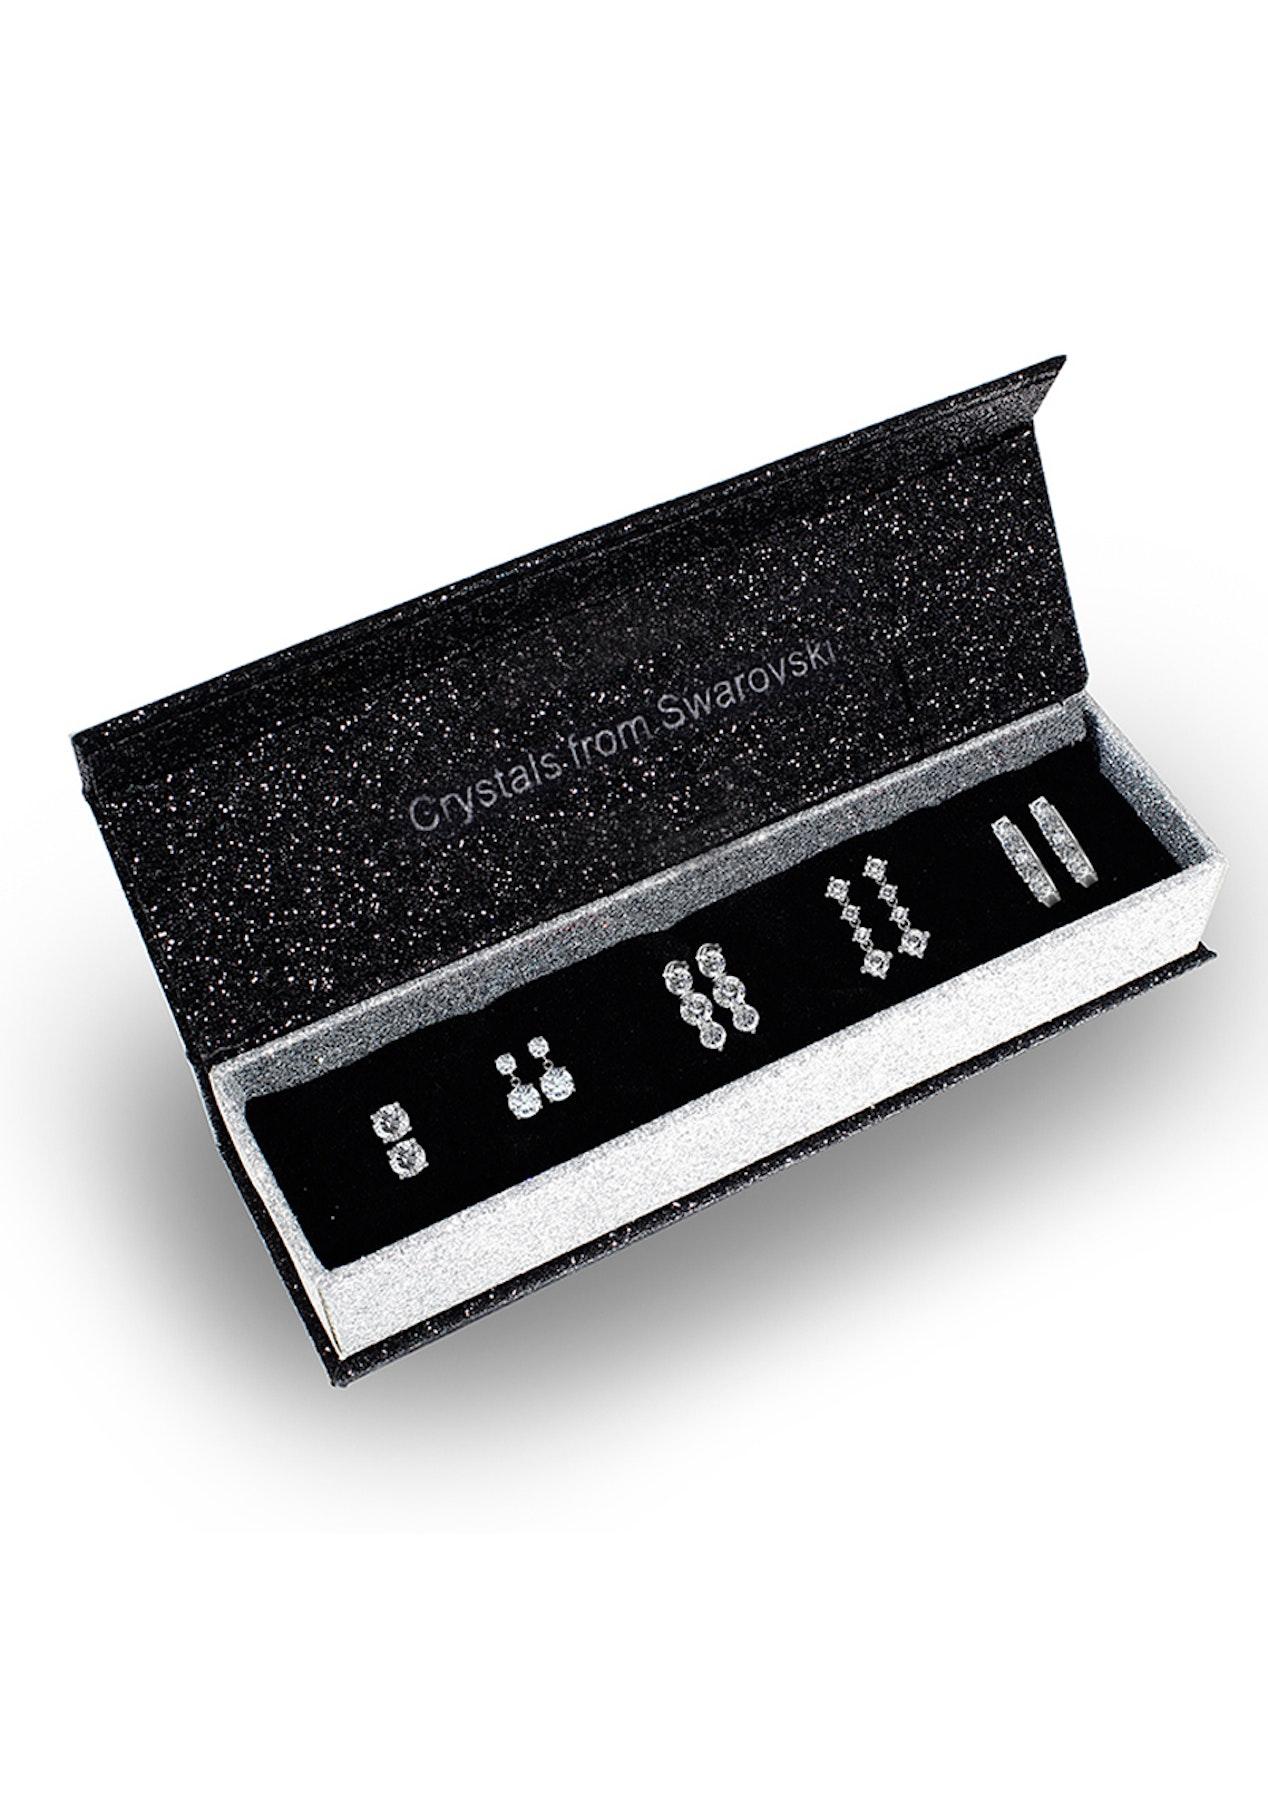 Boxed Swarovski Crystal Earring Set - 5 Pair - Best of Swarovski Elements -  Onceit 10d737cdd